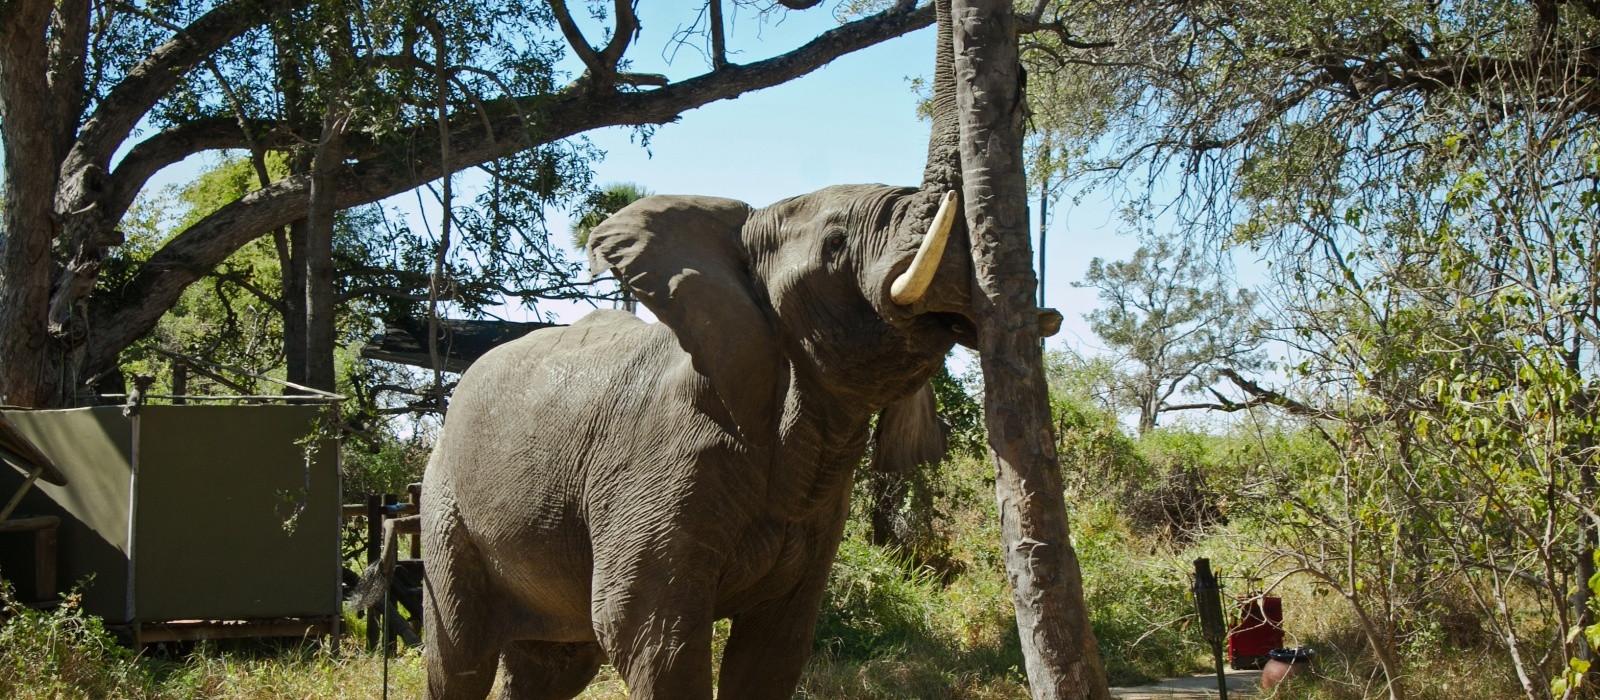 Elefant im Oddballs Camp in Okavango Delta, Botswana